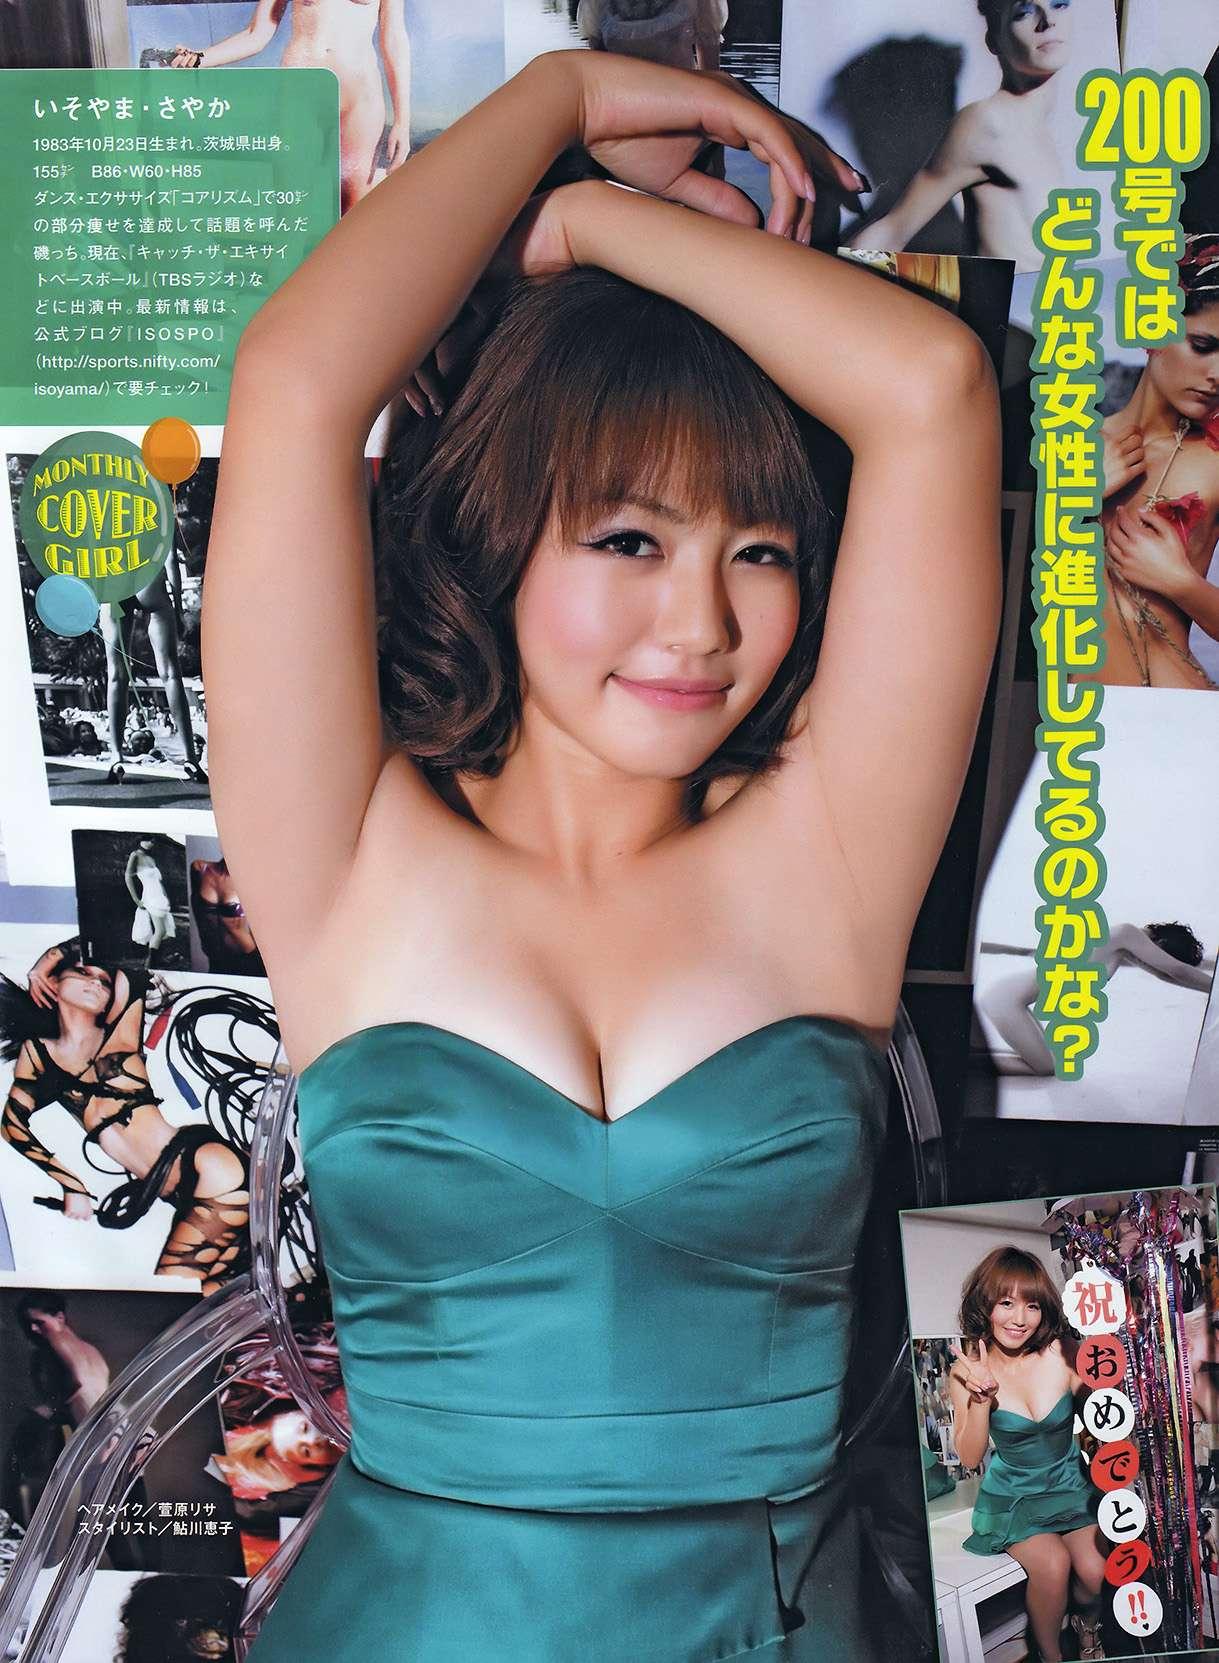 livedoor.jp imagesize 956x1440